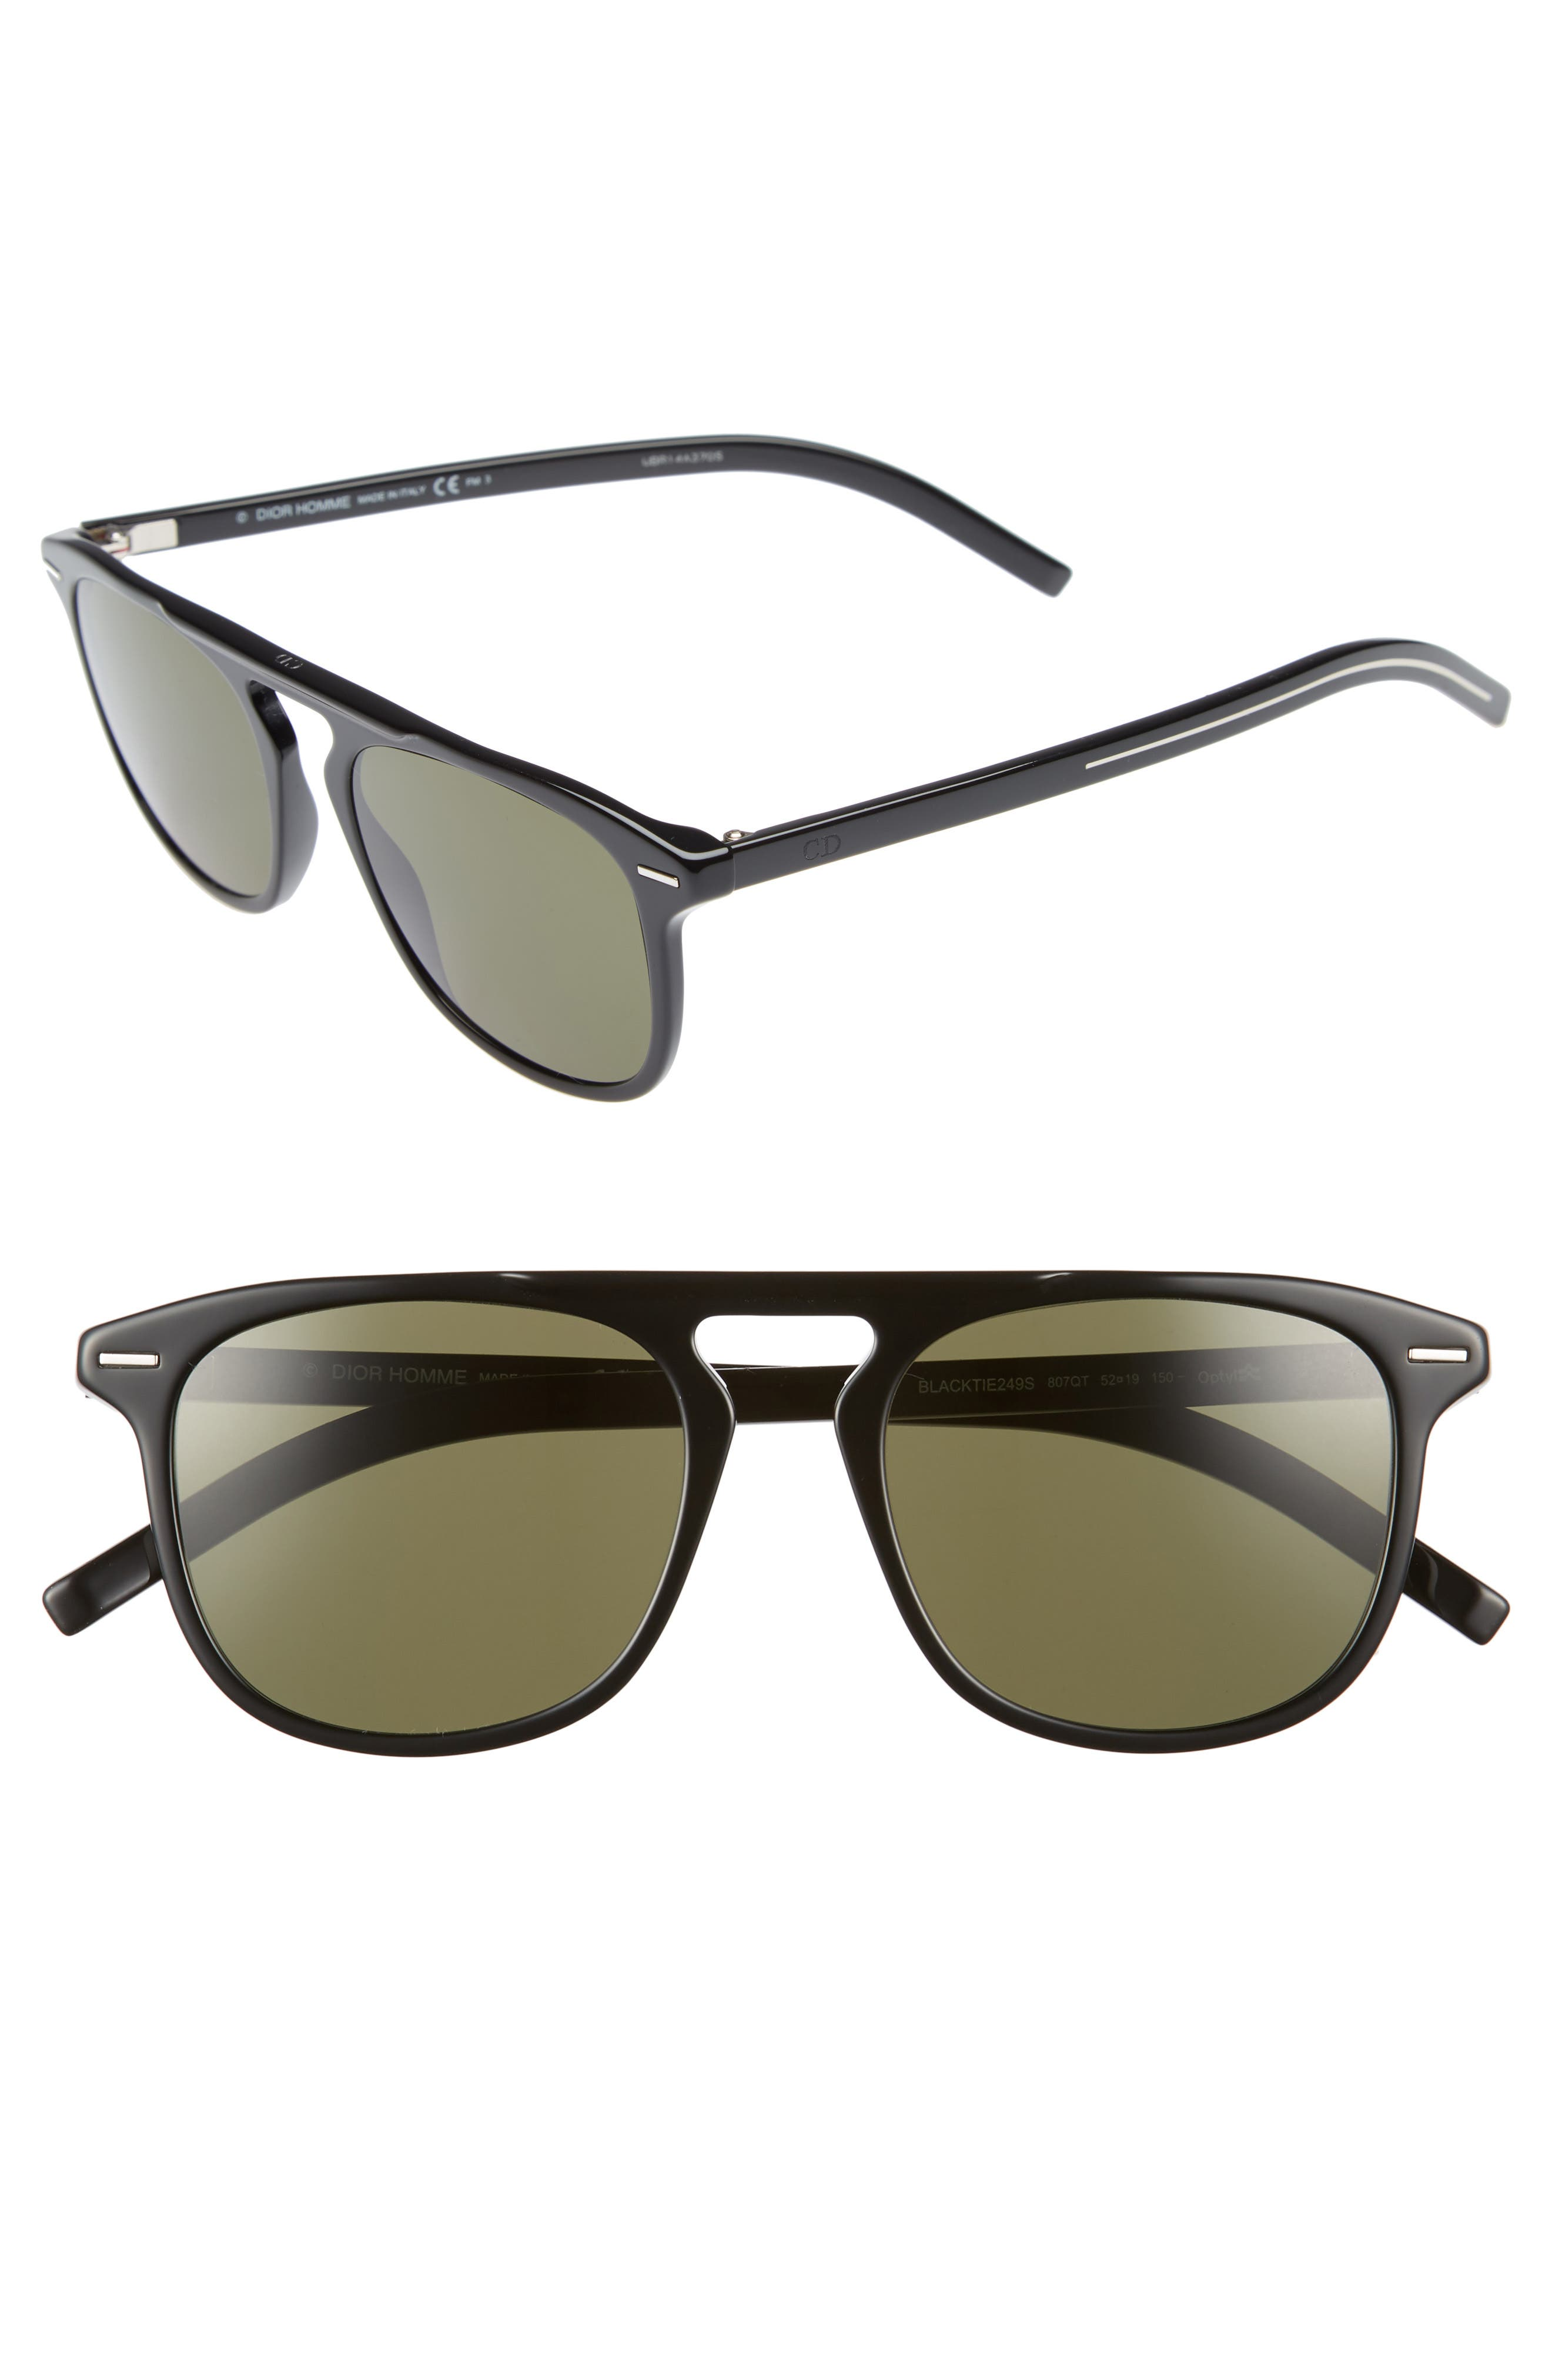 DIOR HOMME 52Mm Sunglasses - Black